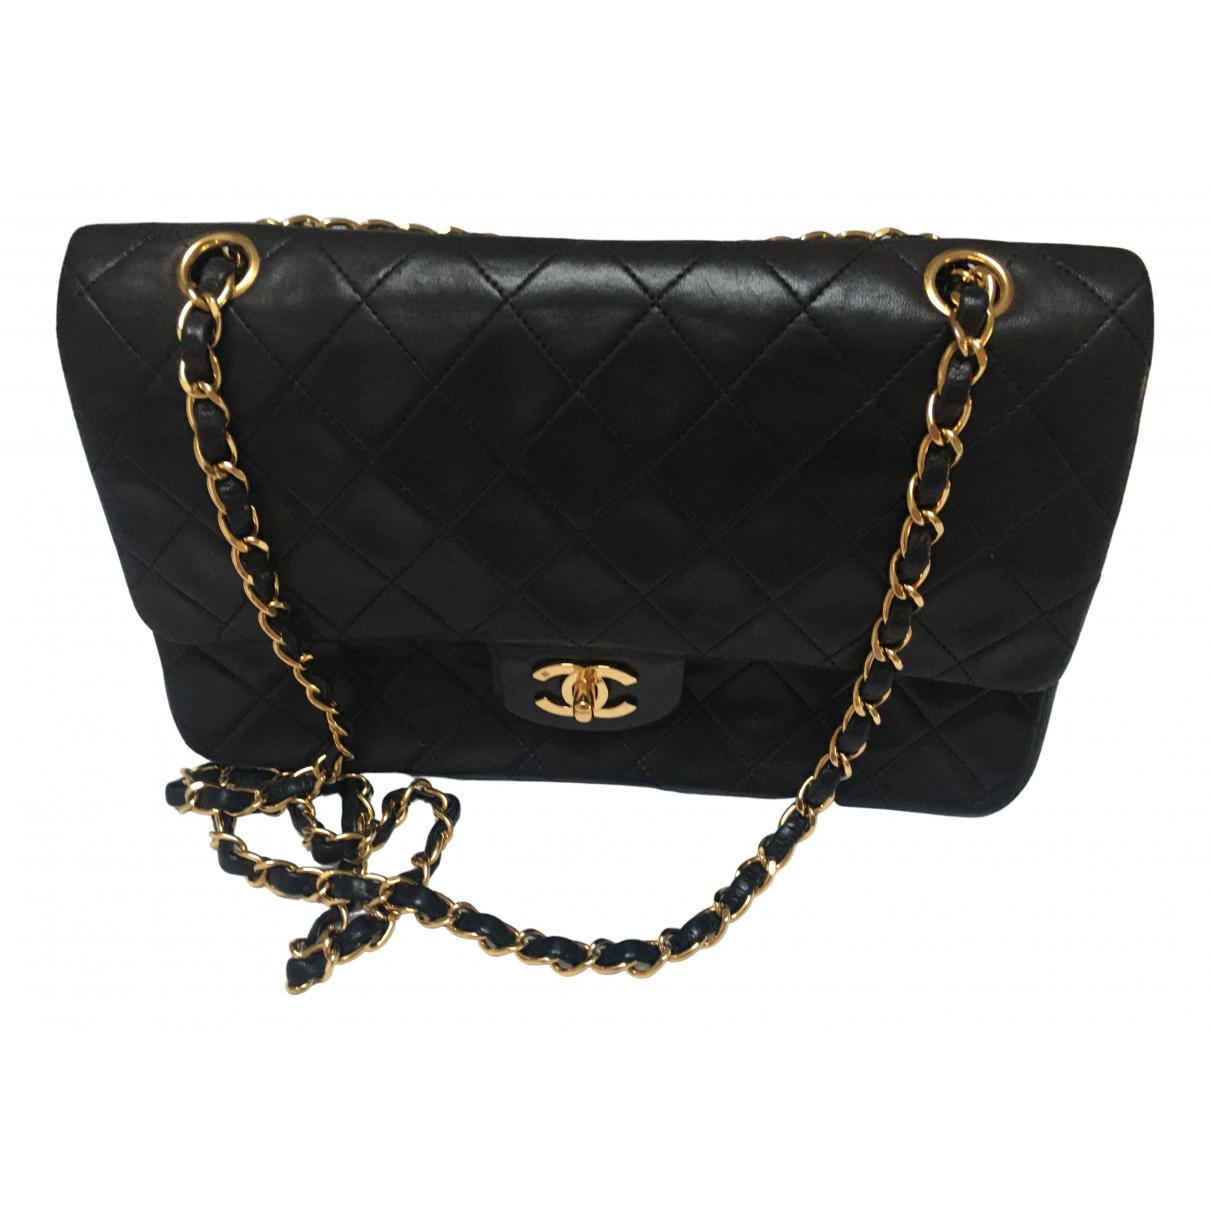 Chanel Timeless/Classique Black Leather handbag for Women N